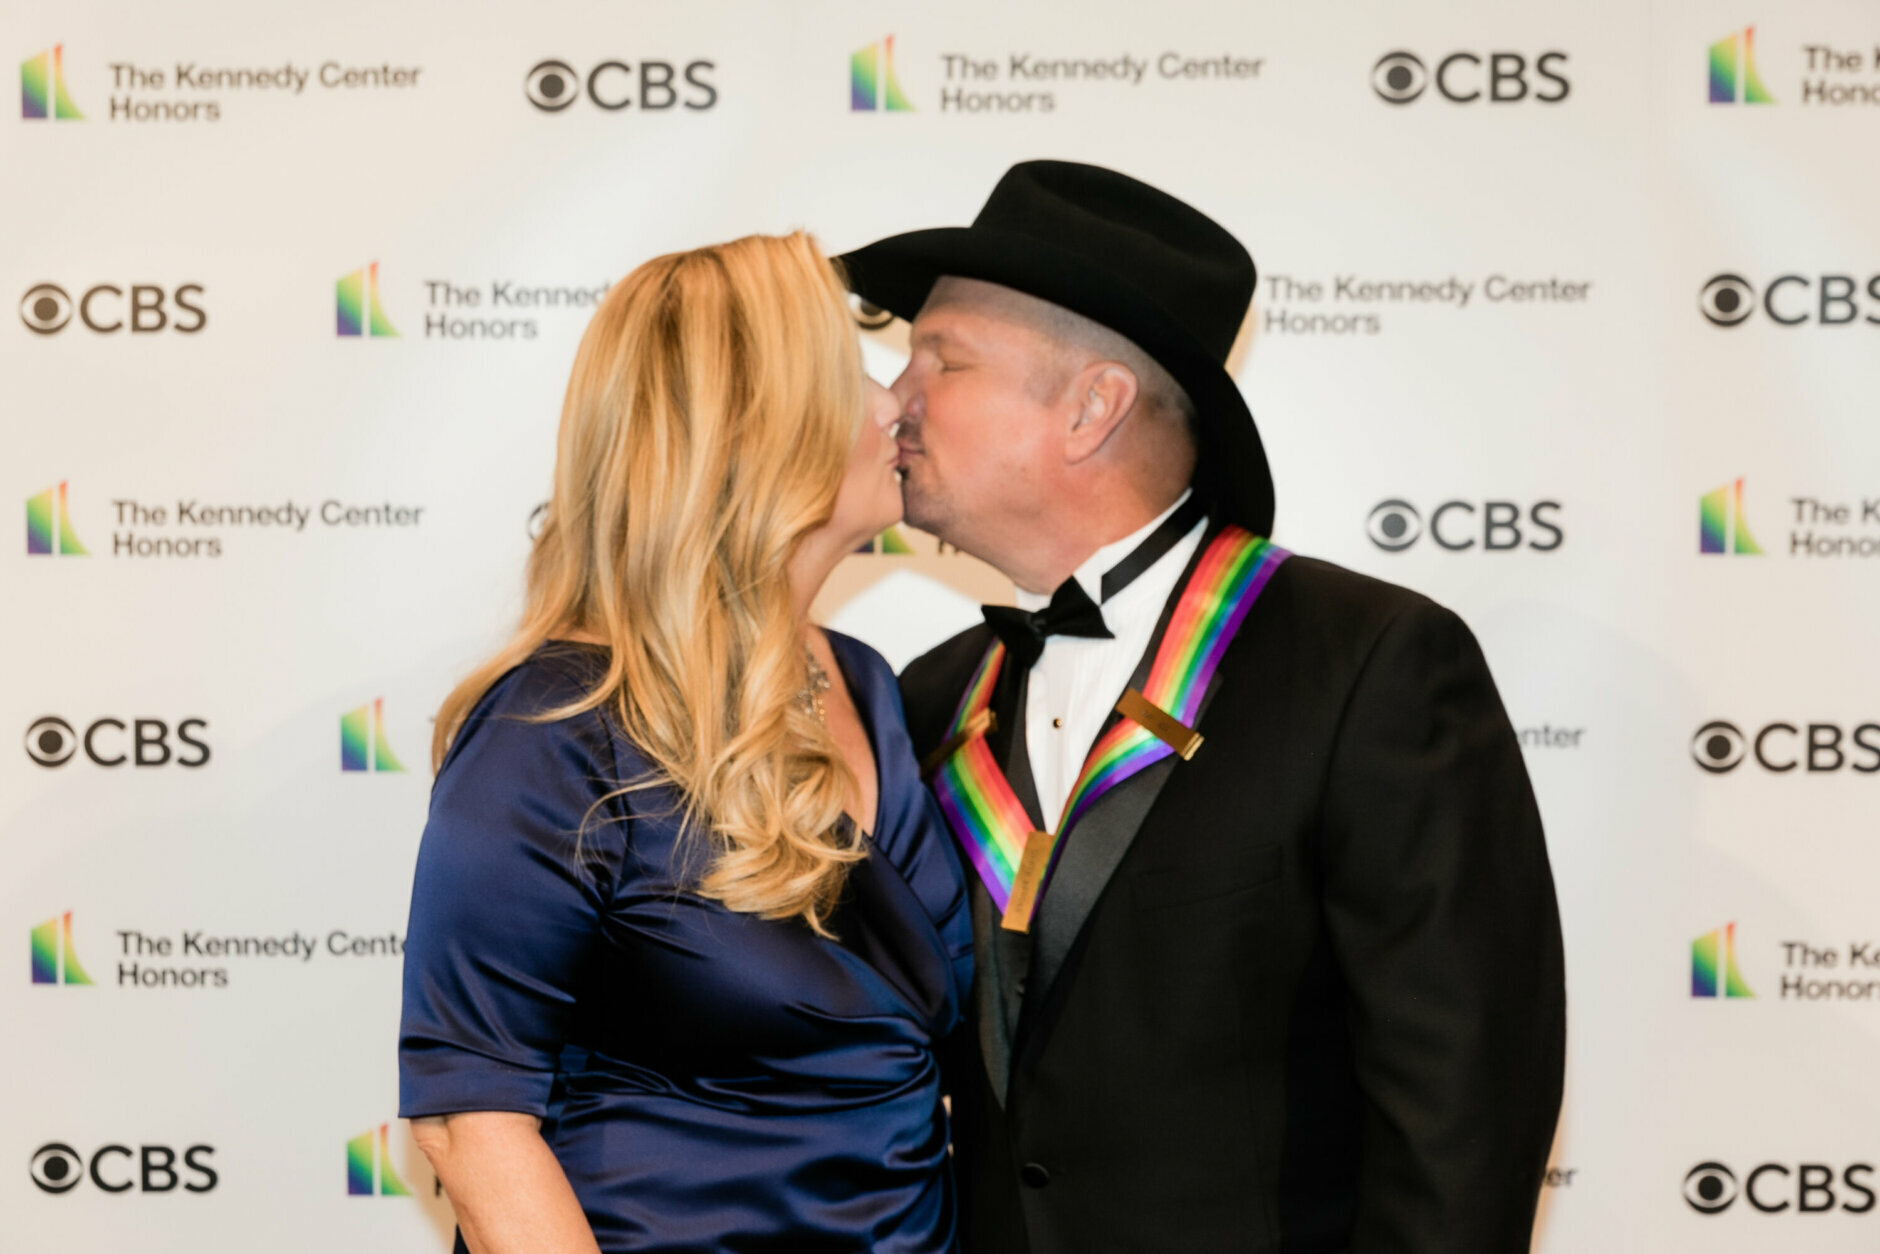 <p>Garth Brooks and Trisha Yearwood on the red carpet. (Tracey Salazar)</p>